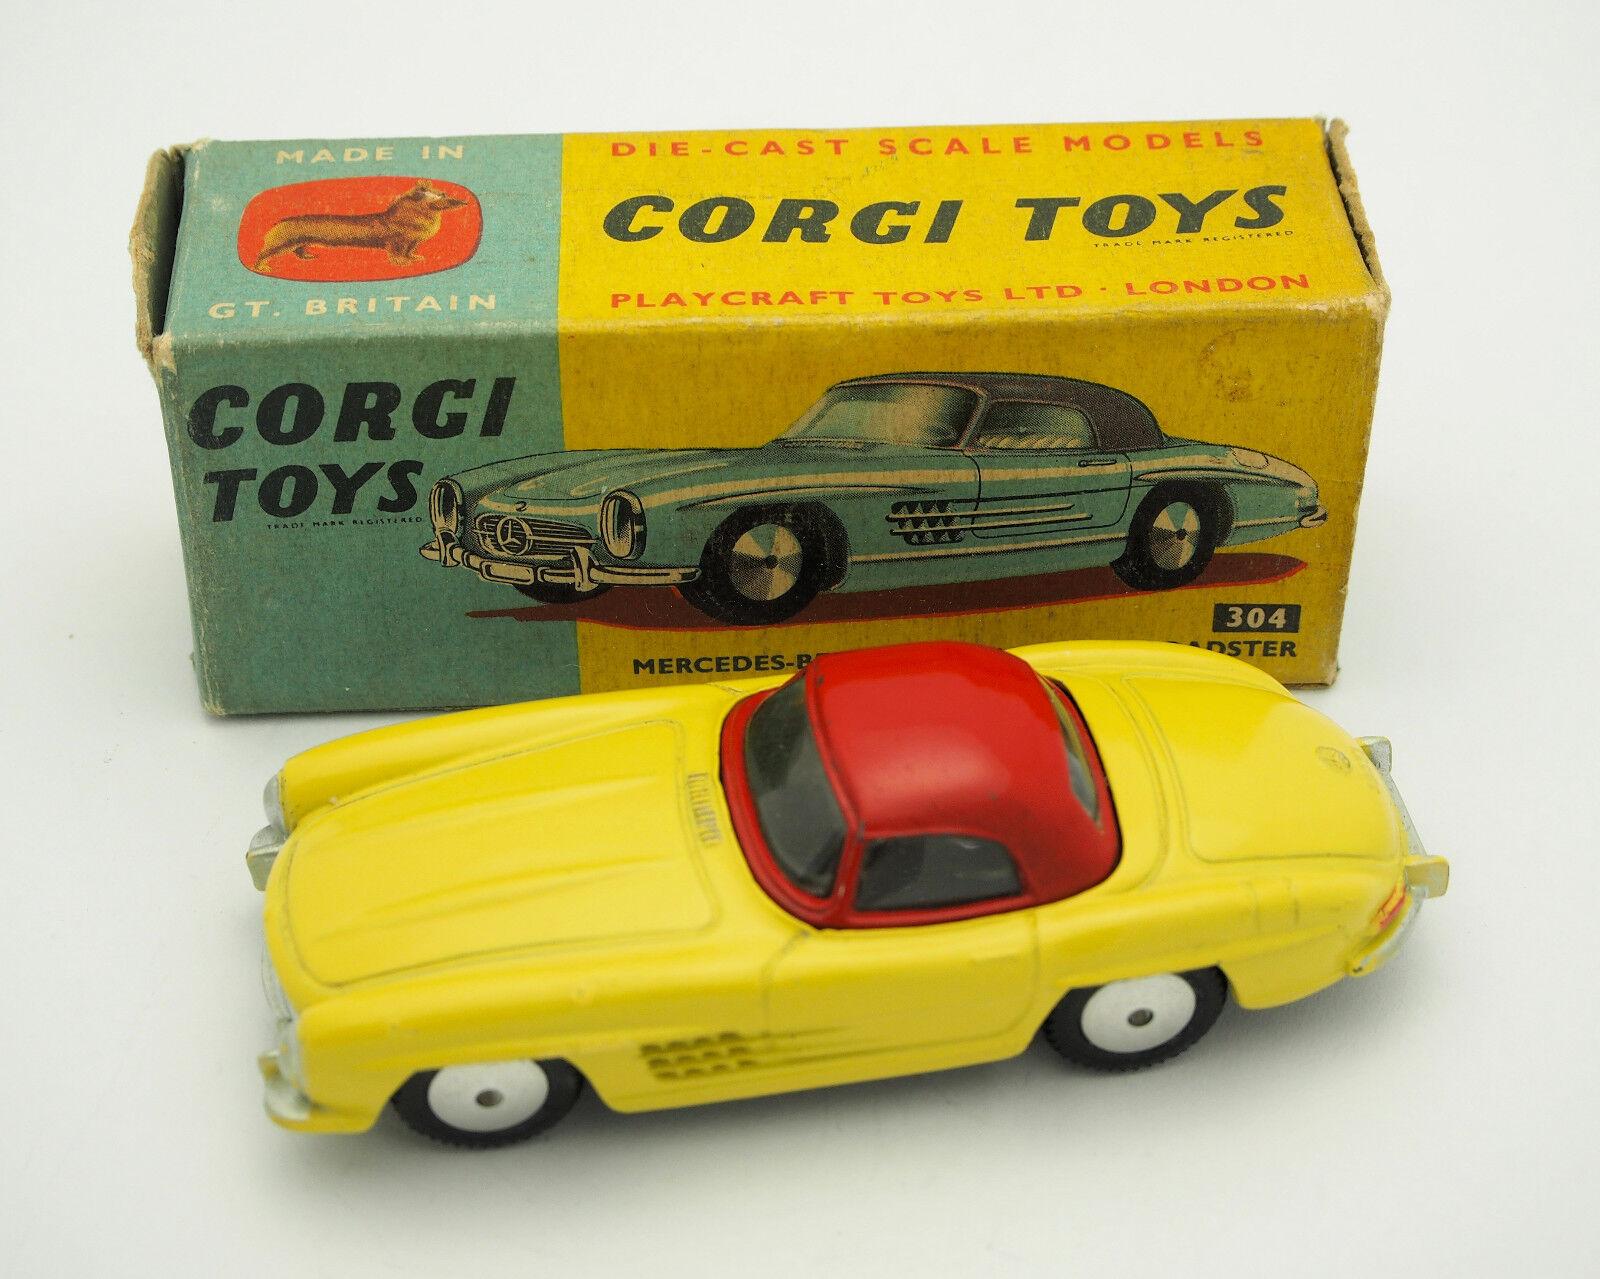 CORGI 304 MERCEDES 300 SL ROADSTER boîte d'origine